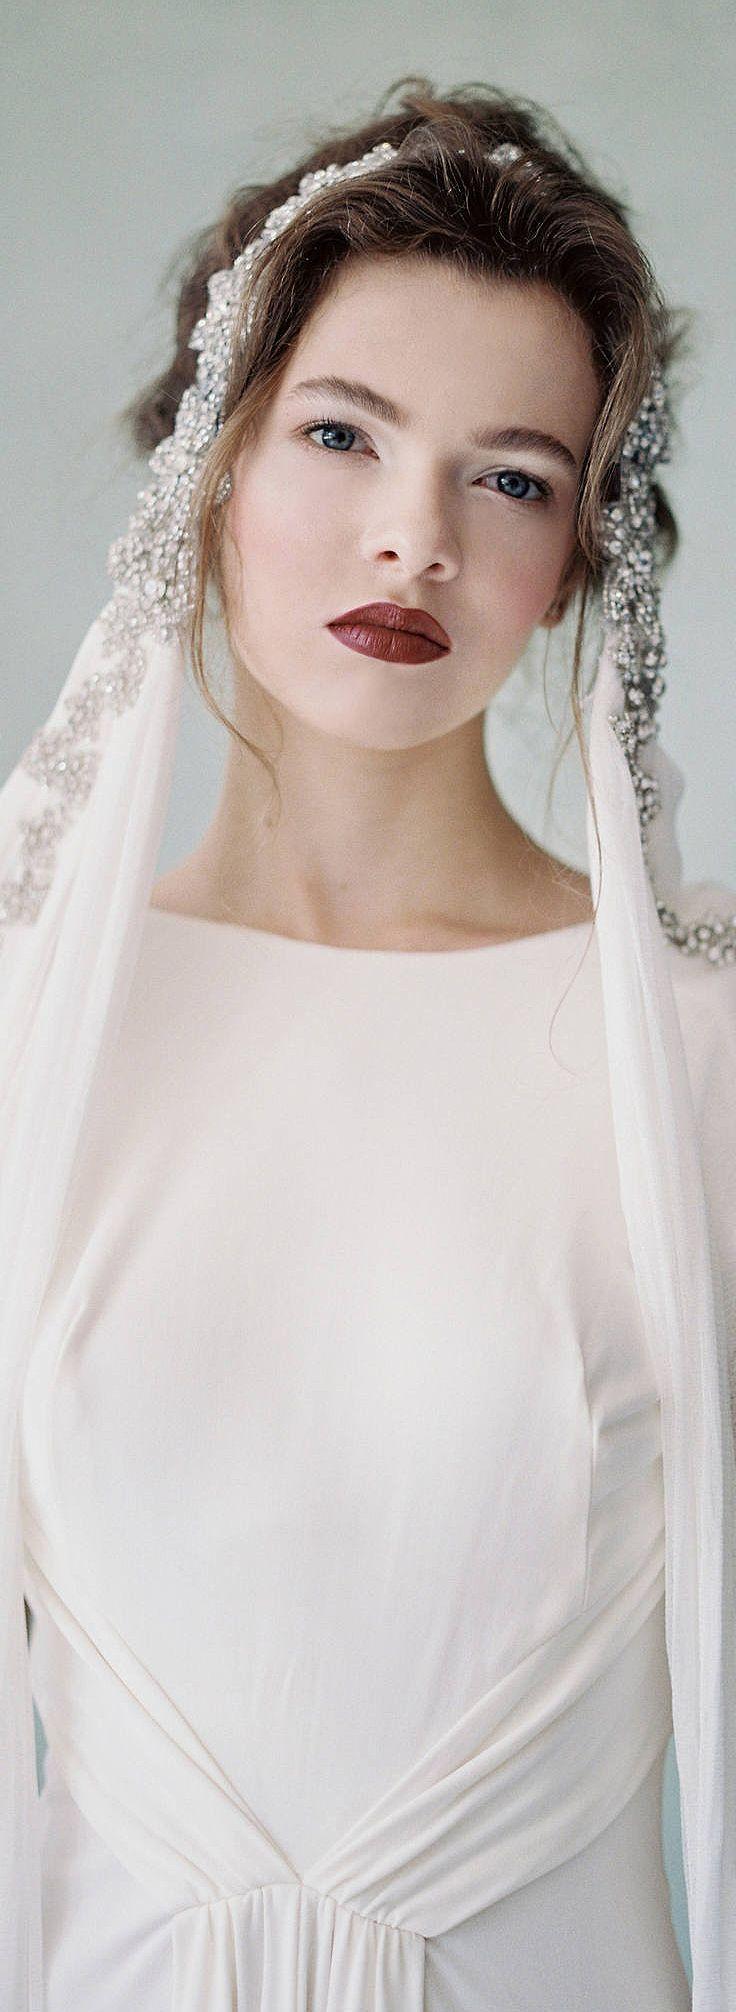 Gibson bespoke bridal veil our picks of the best bridal veils